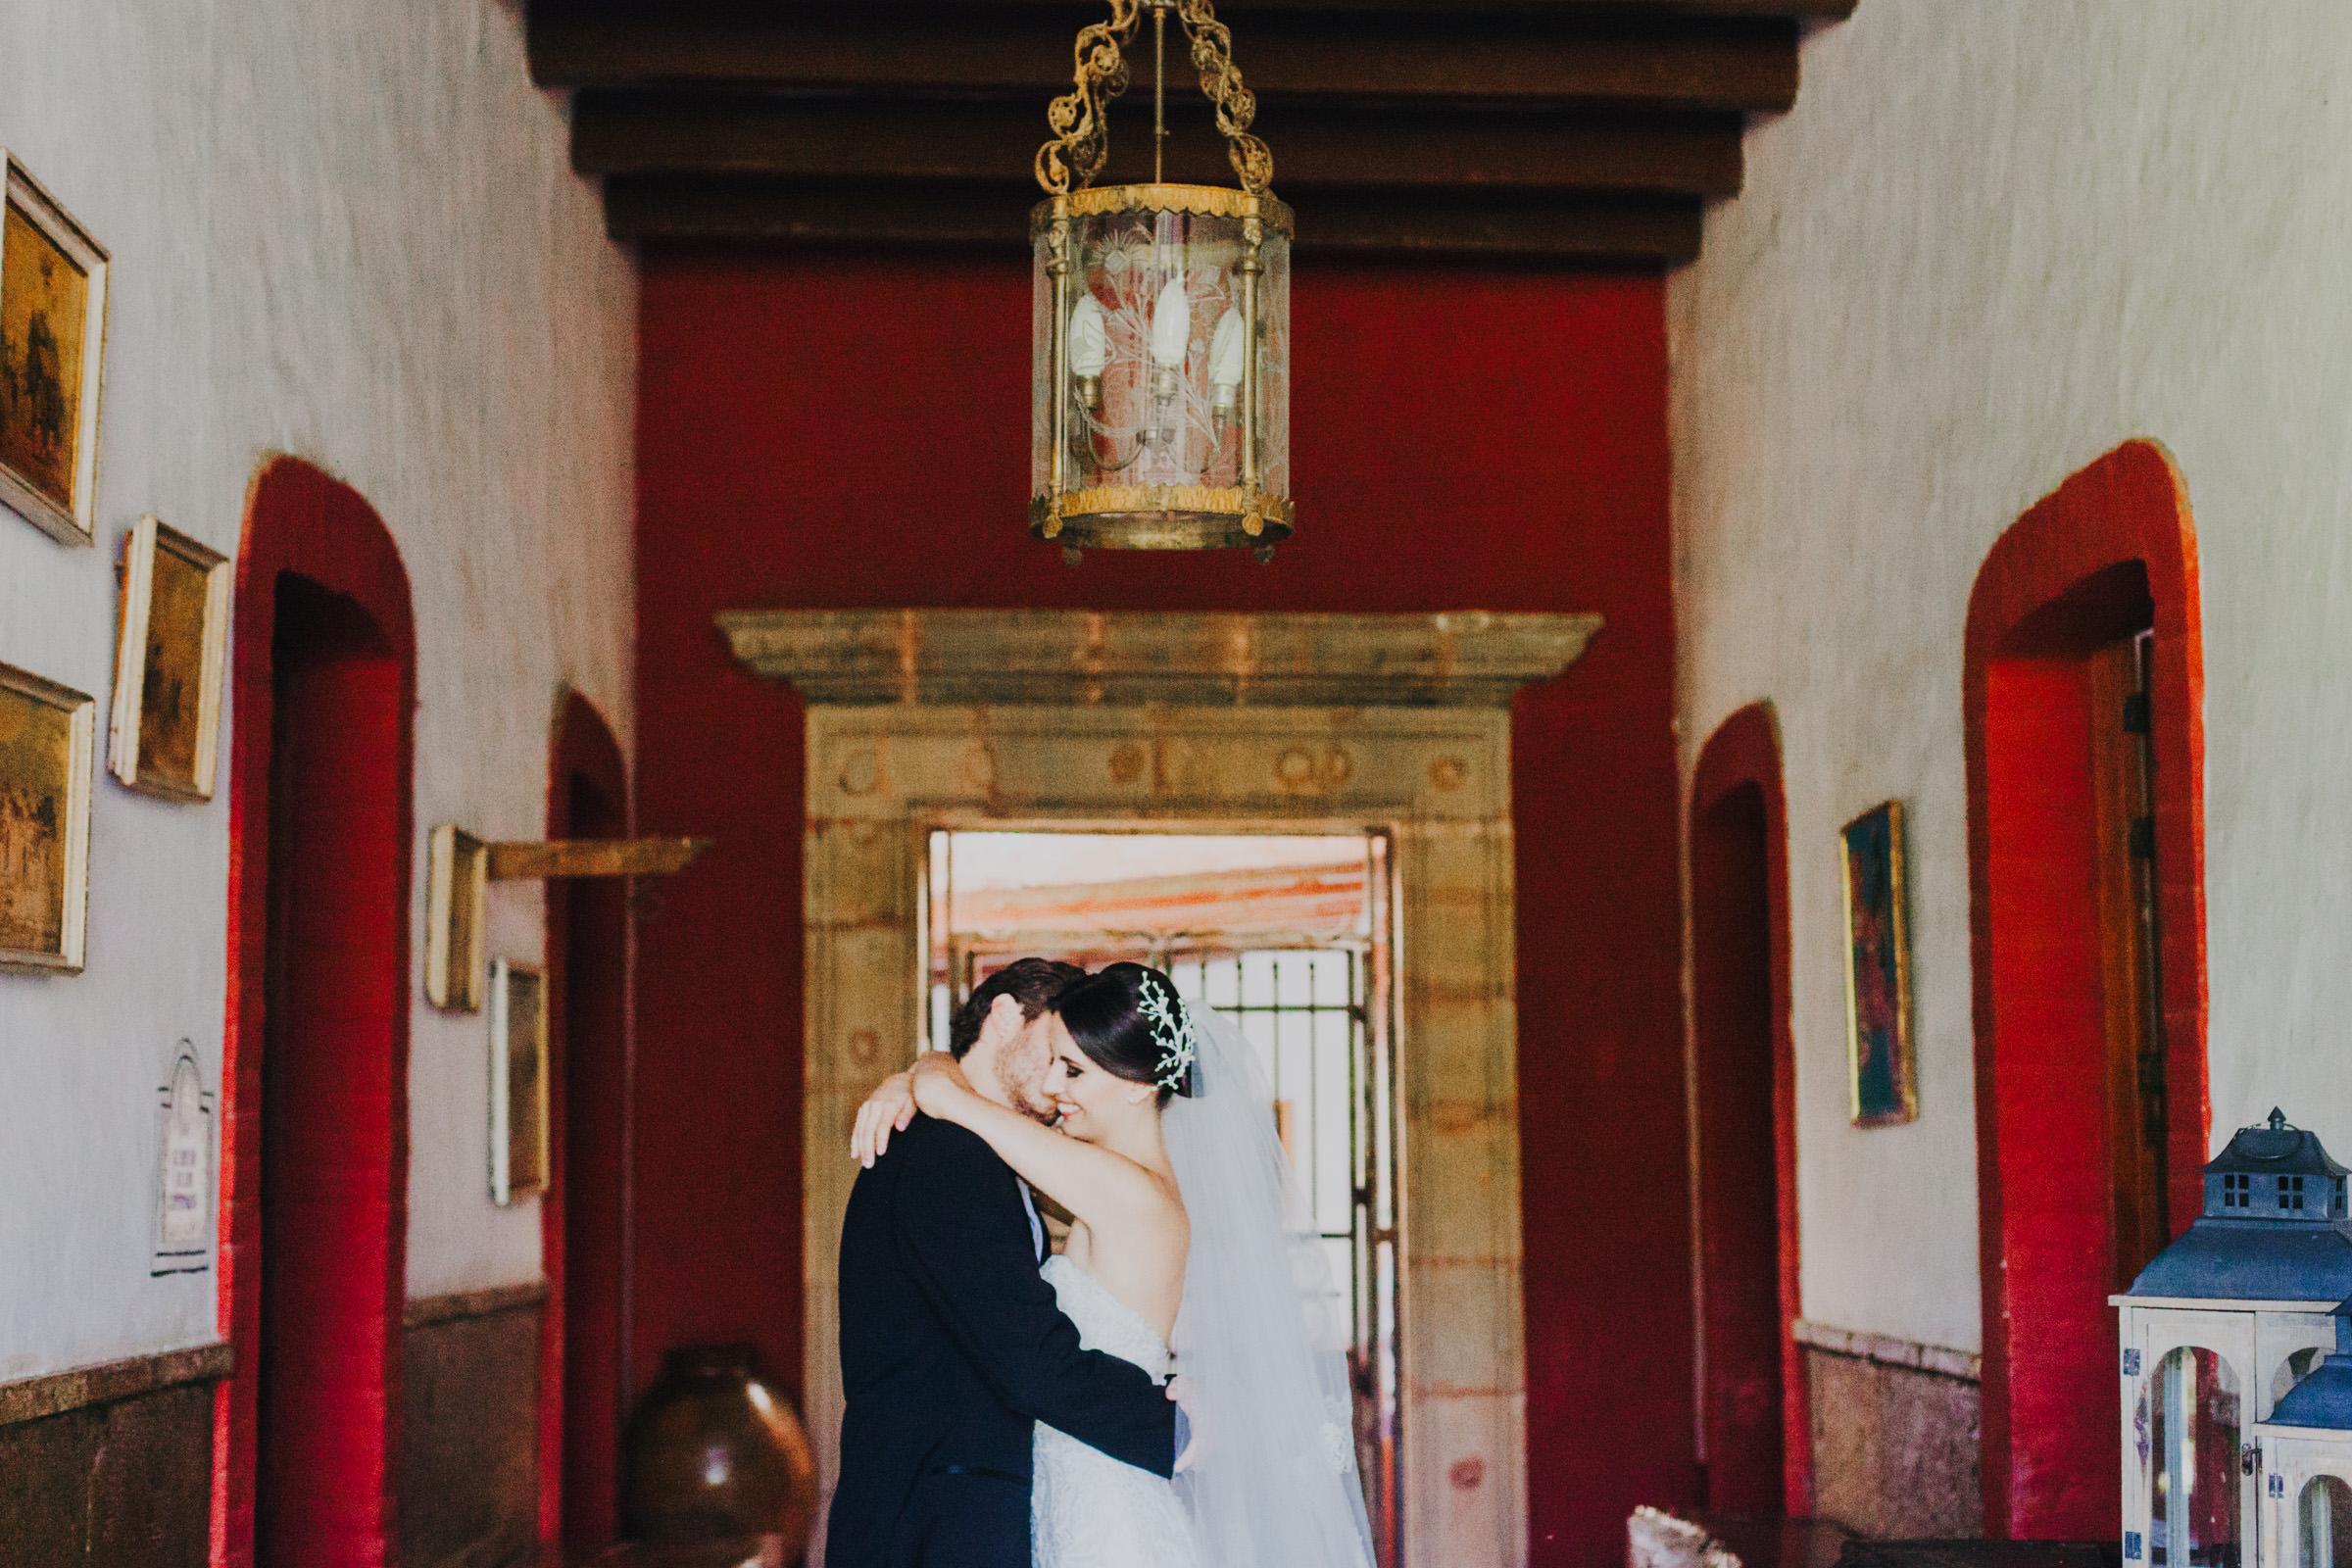 irapuato-boda-fotografia-jardines-alcalde-guanajuato-paulina-juan-pedro--56.jpg